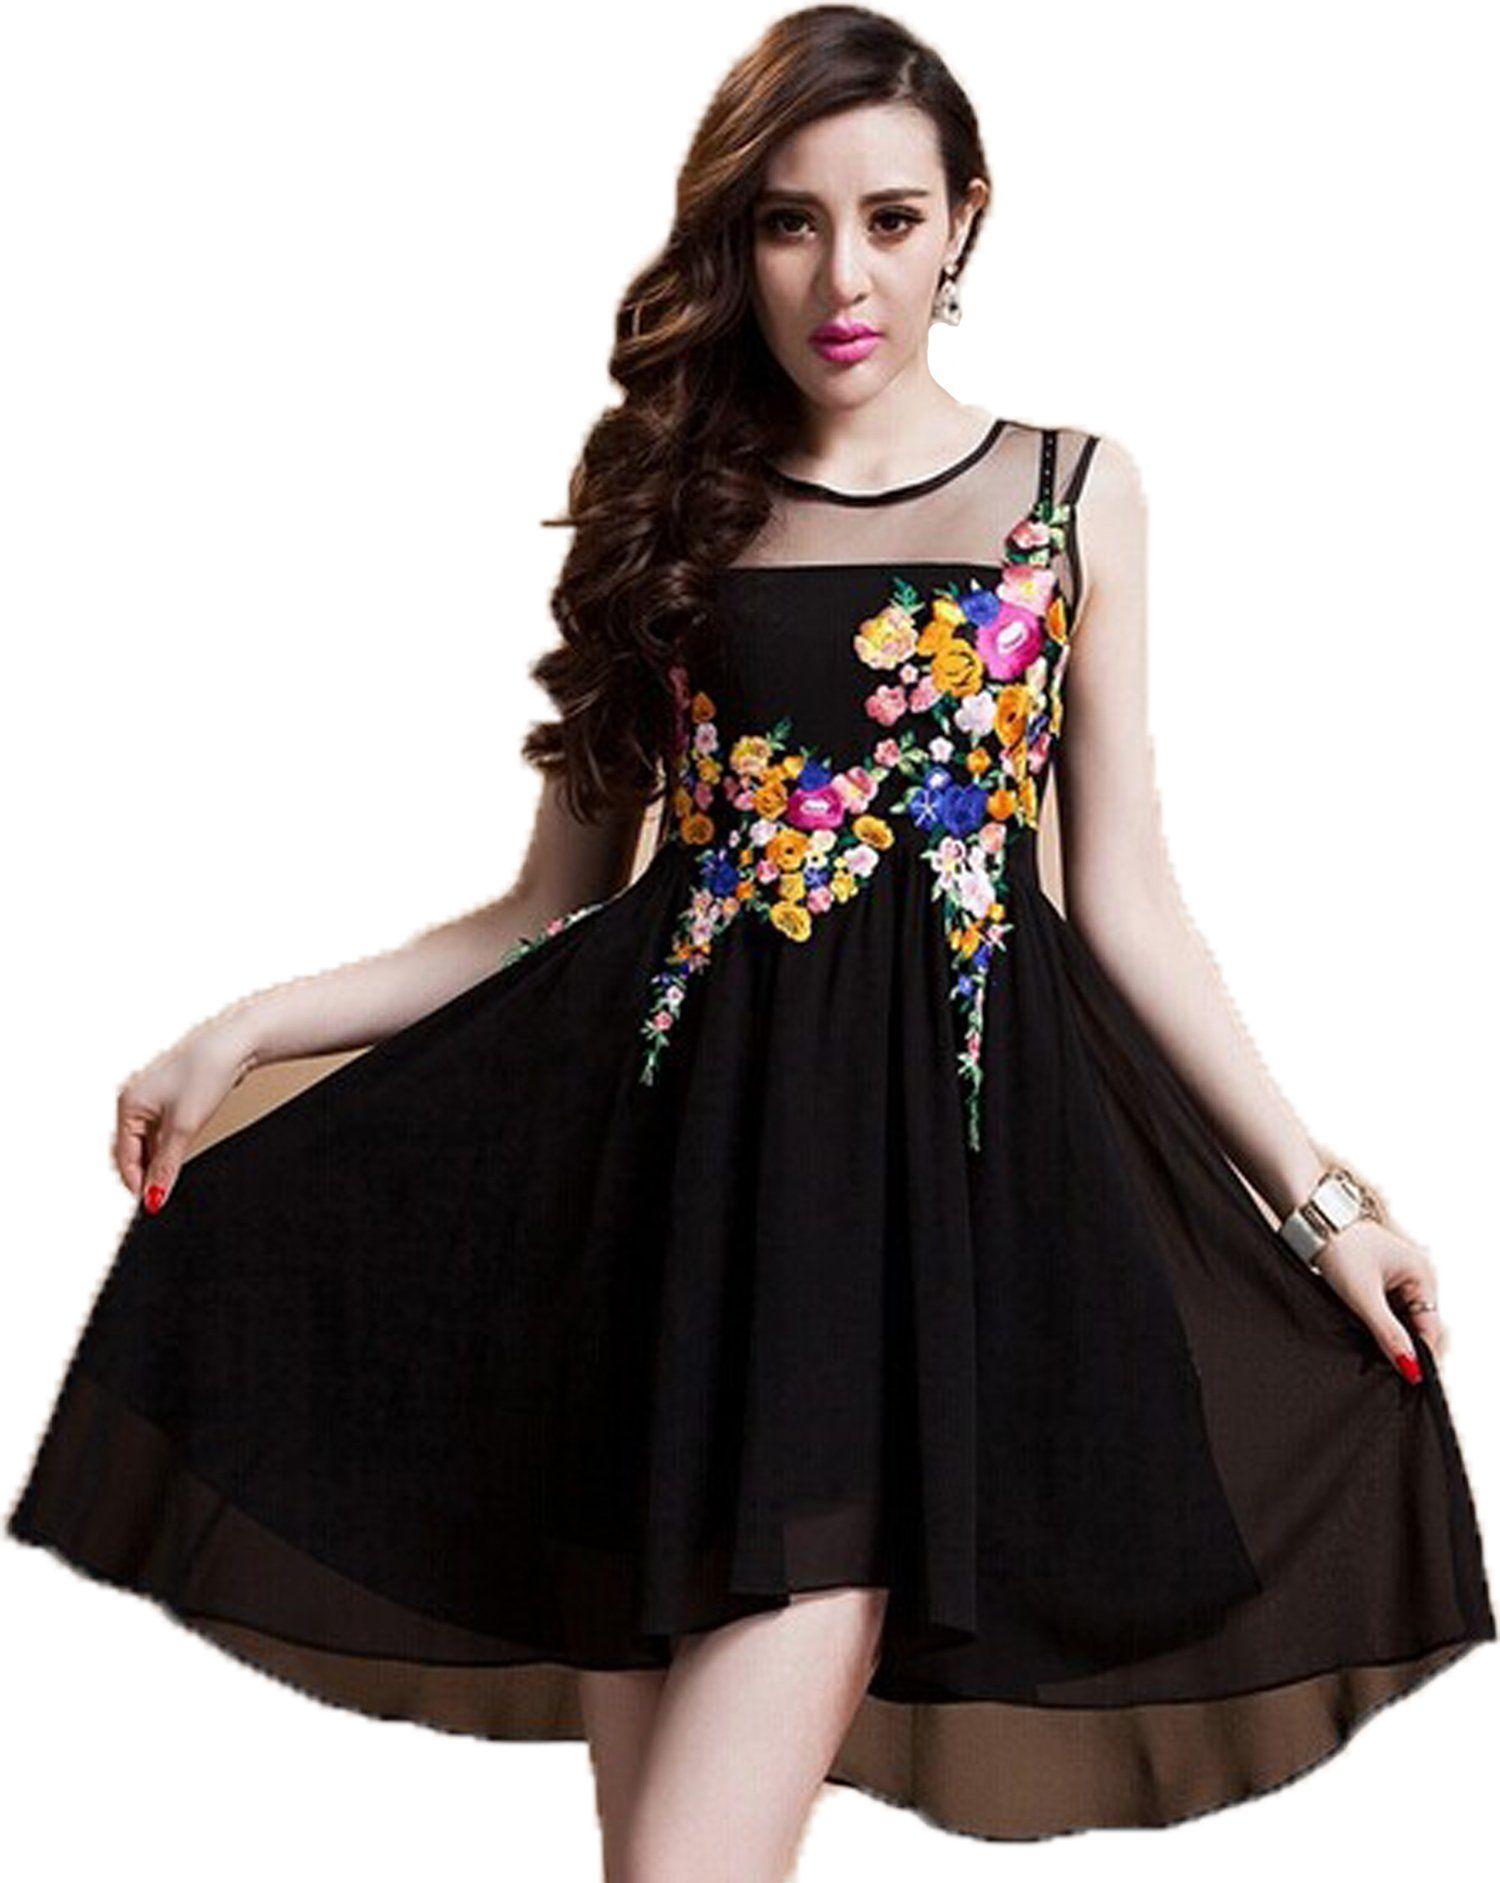 Amazon new arrival womenus dress ladiesu mesh dress embroidered